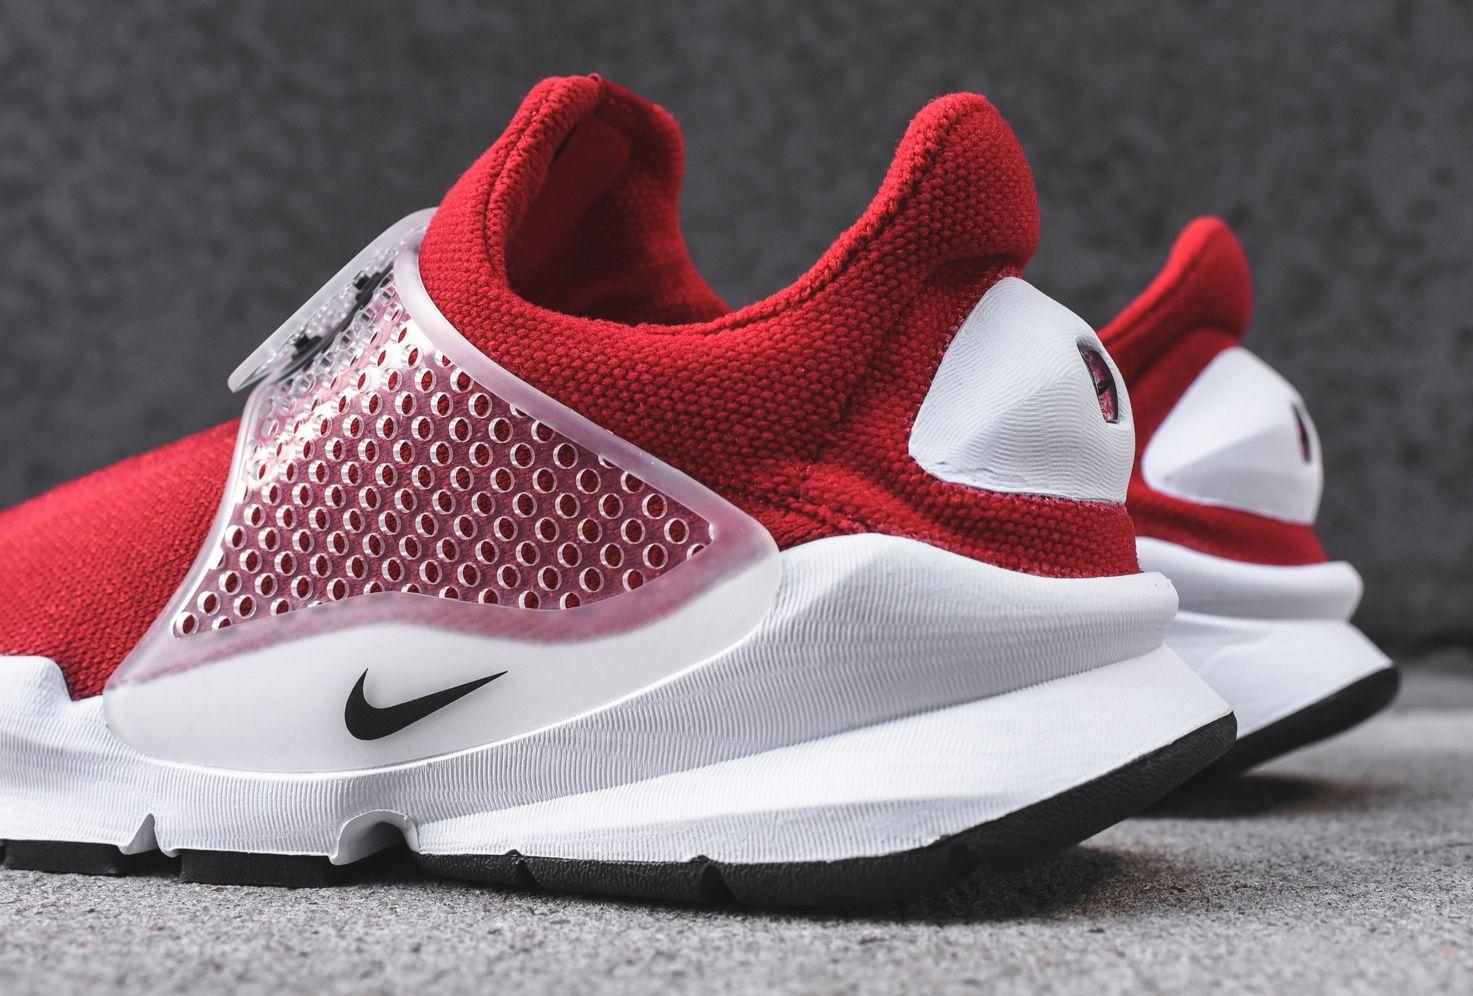 detailed look 327ef 2dd35 Nike Sock Dart Gym Red | NBA/basketball shoes/shoes | Sock ...